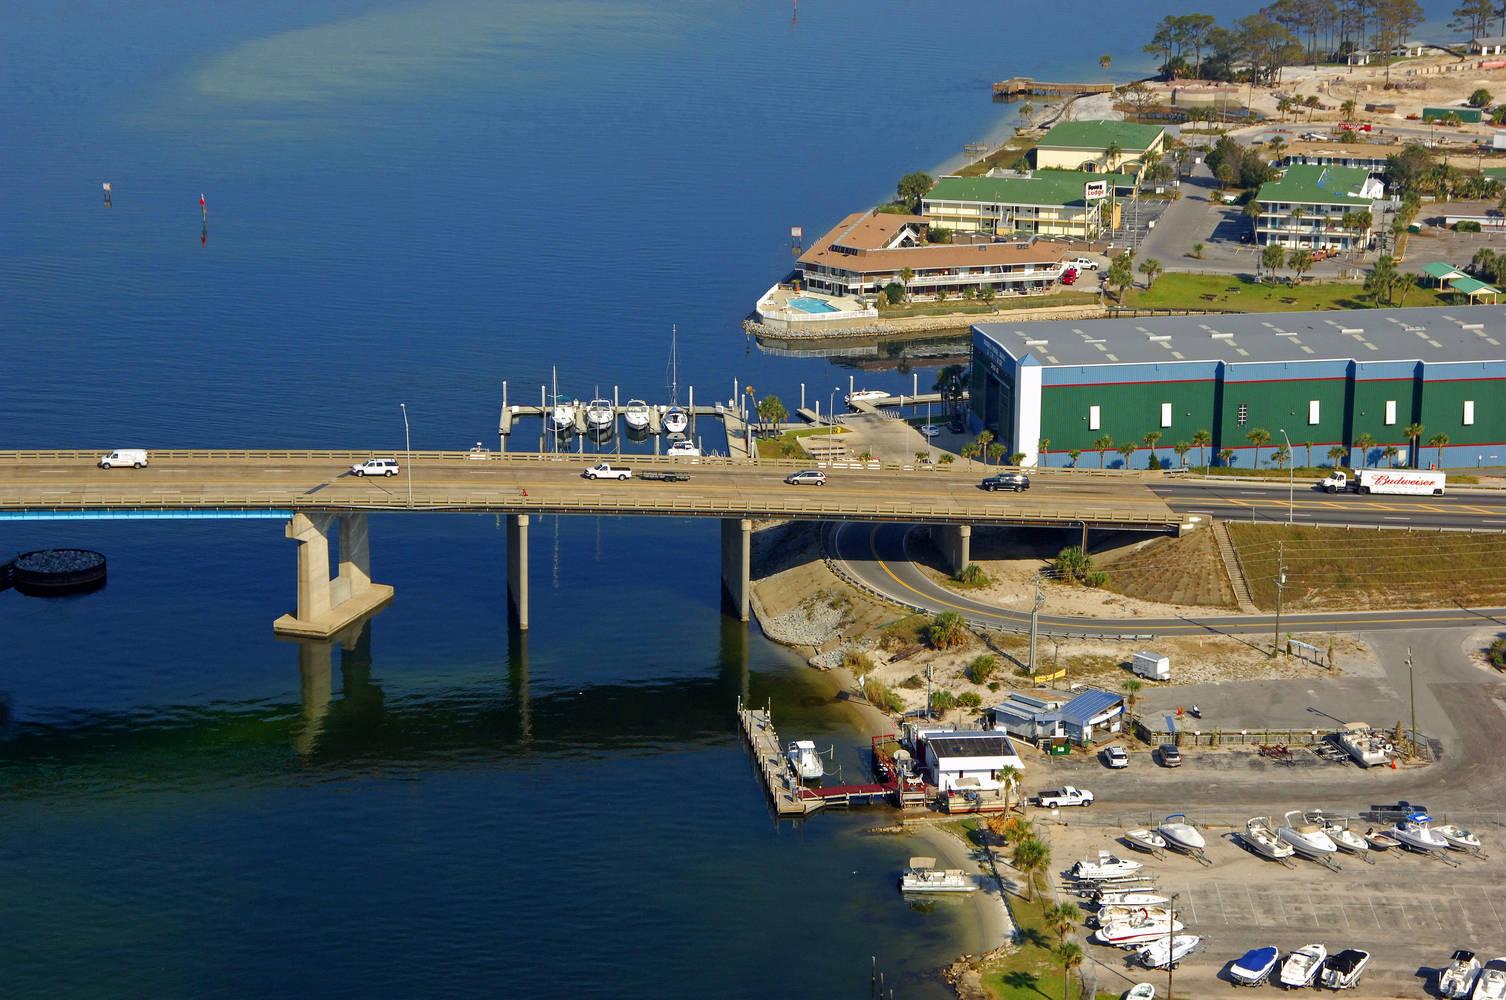 Brooks Bridge Marina Amp Dry Storage Slip Dock Mooring